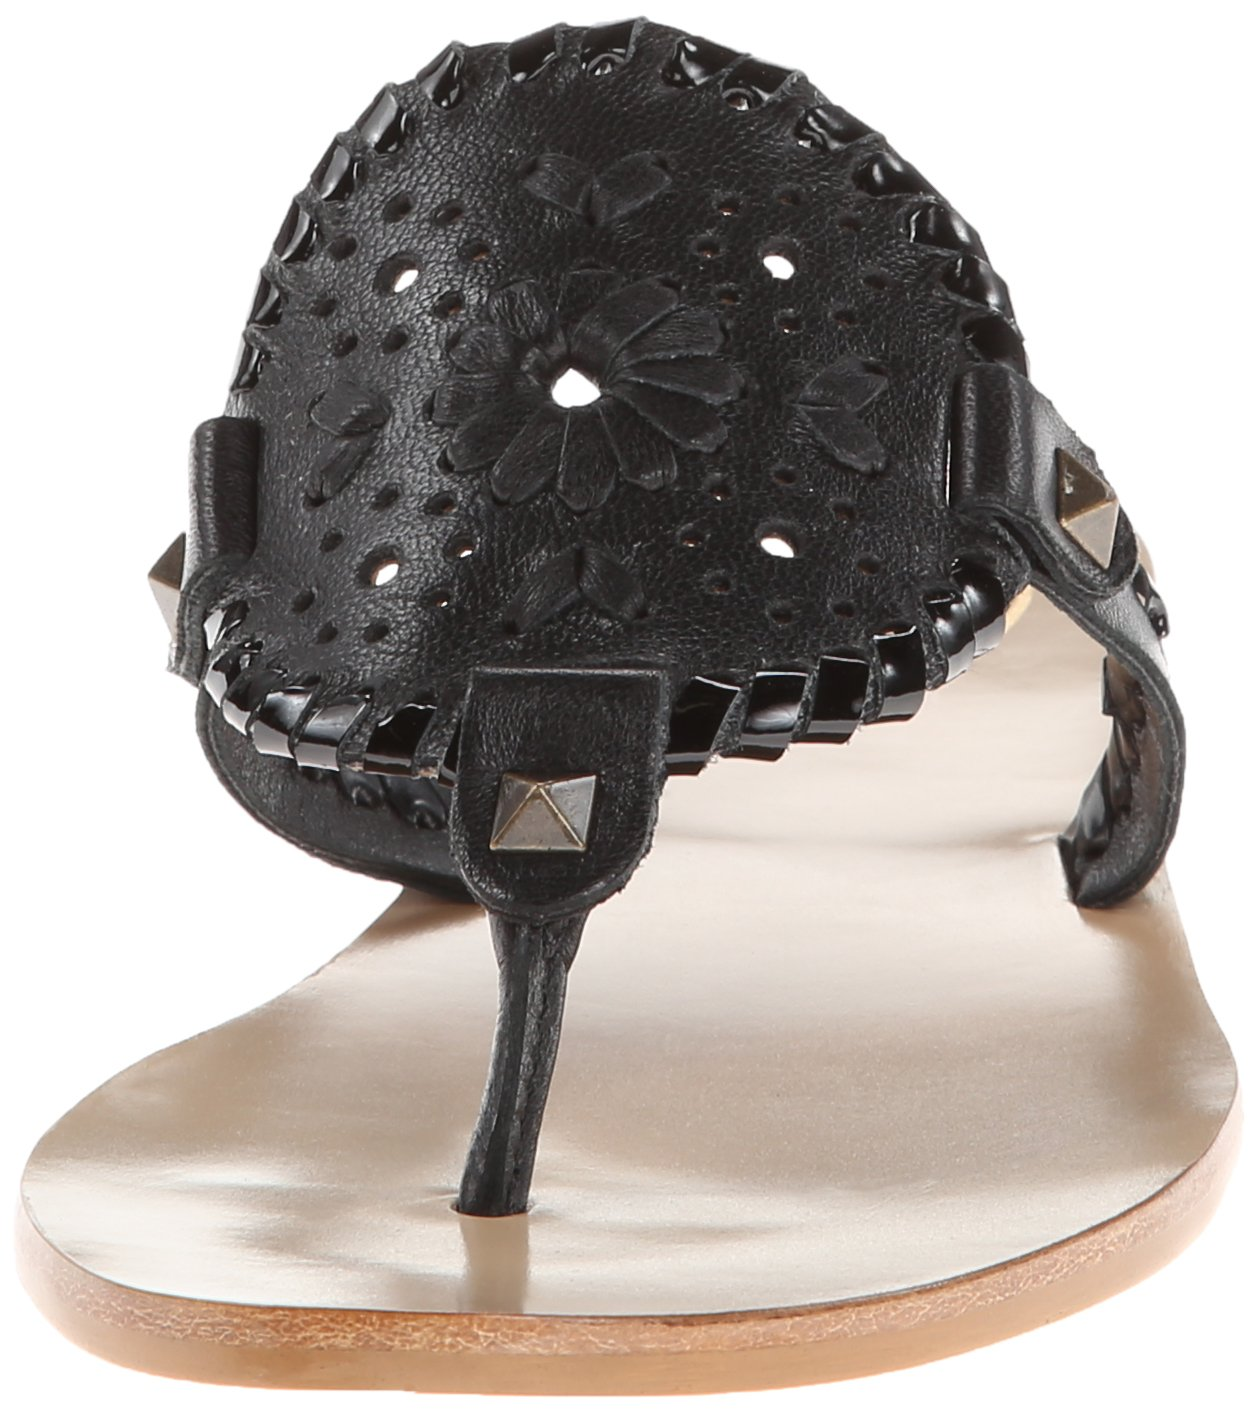 Jack Rogers Women's Georgica Sandal,Black/Black Patent,7 M US by Jack Rogers (Image #4)